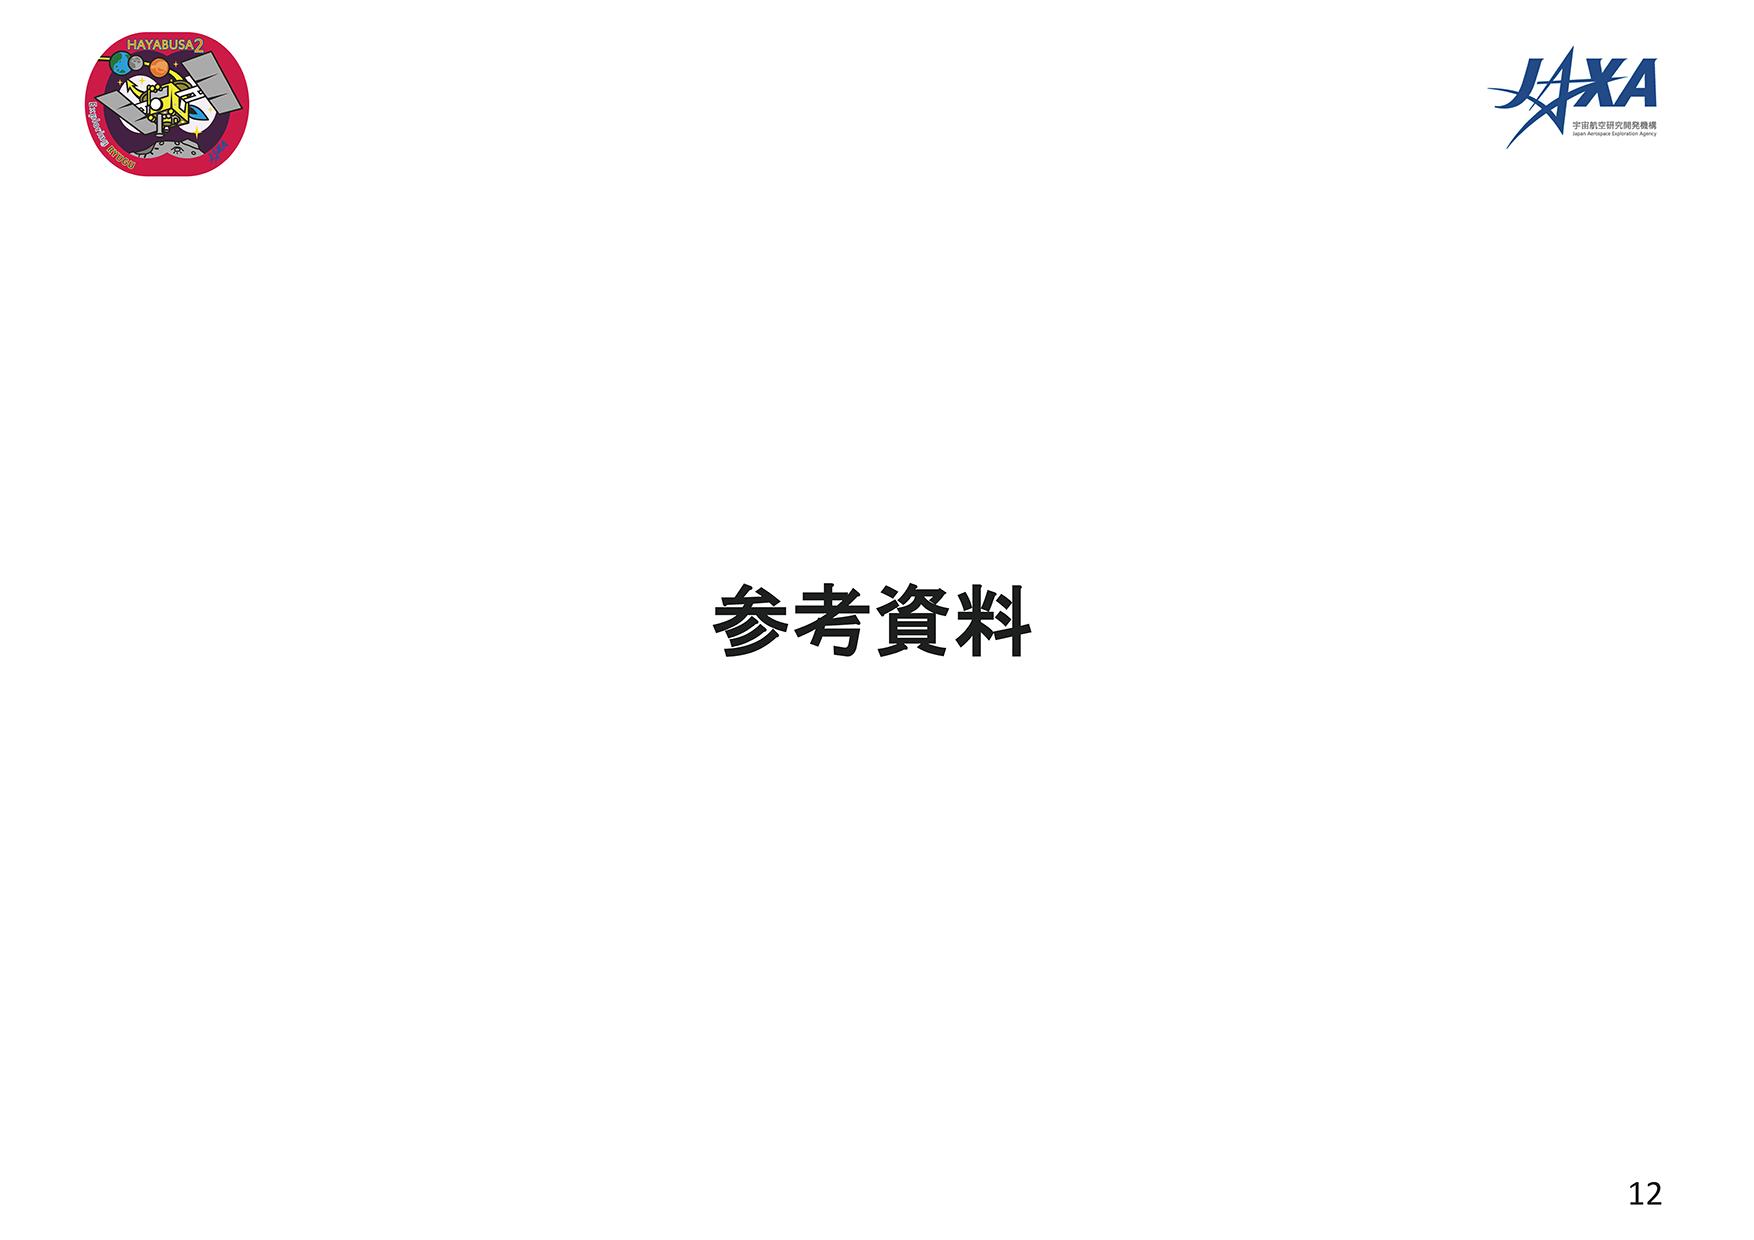 f:id:Imamura:20180921145502p:plain